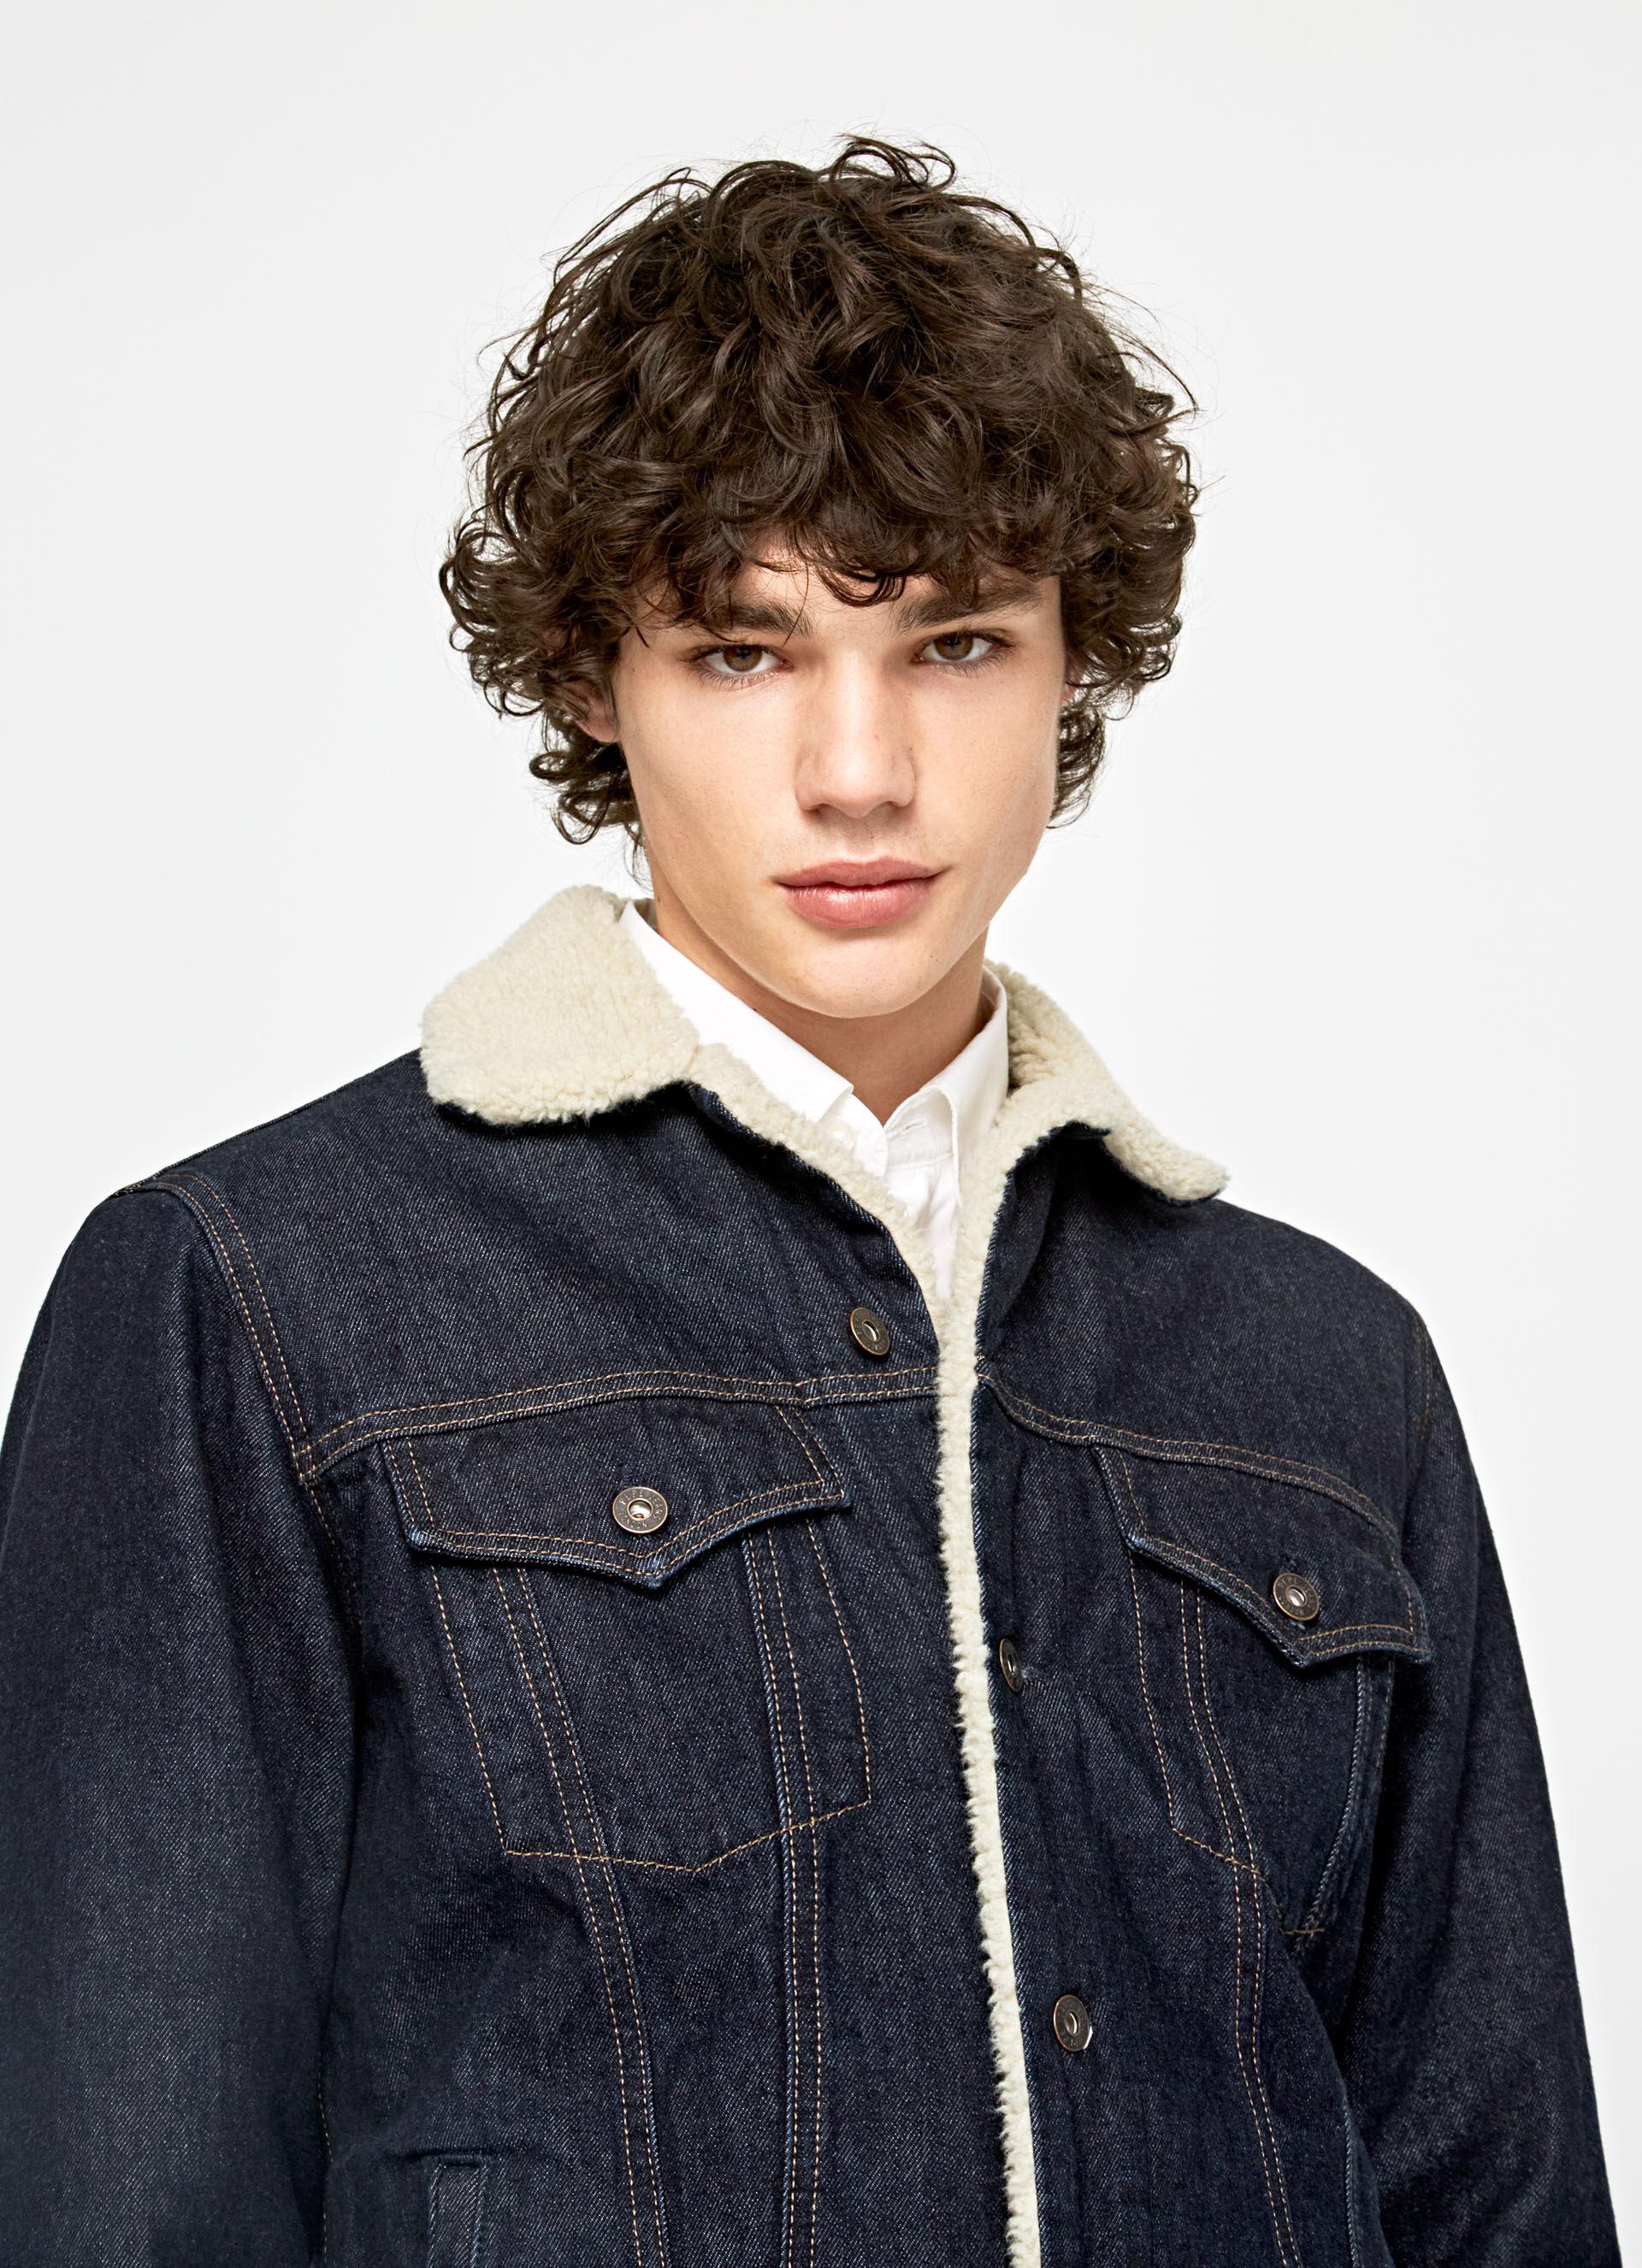 Pepe Jeans: 60% Rabatt auf alles im Sale + gratis Versand ab 30€, z.B. PINNER DLX Denim Jacke